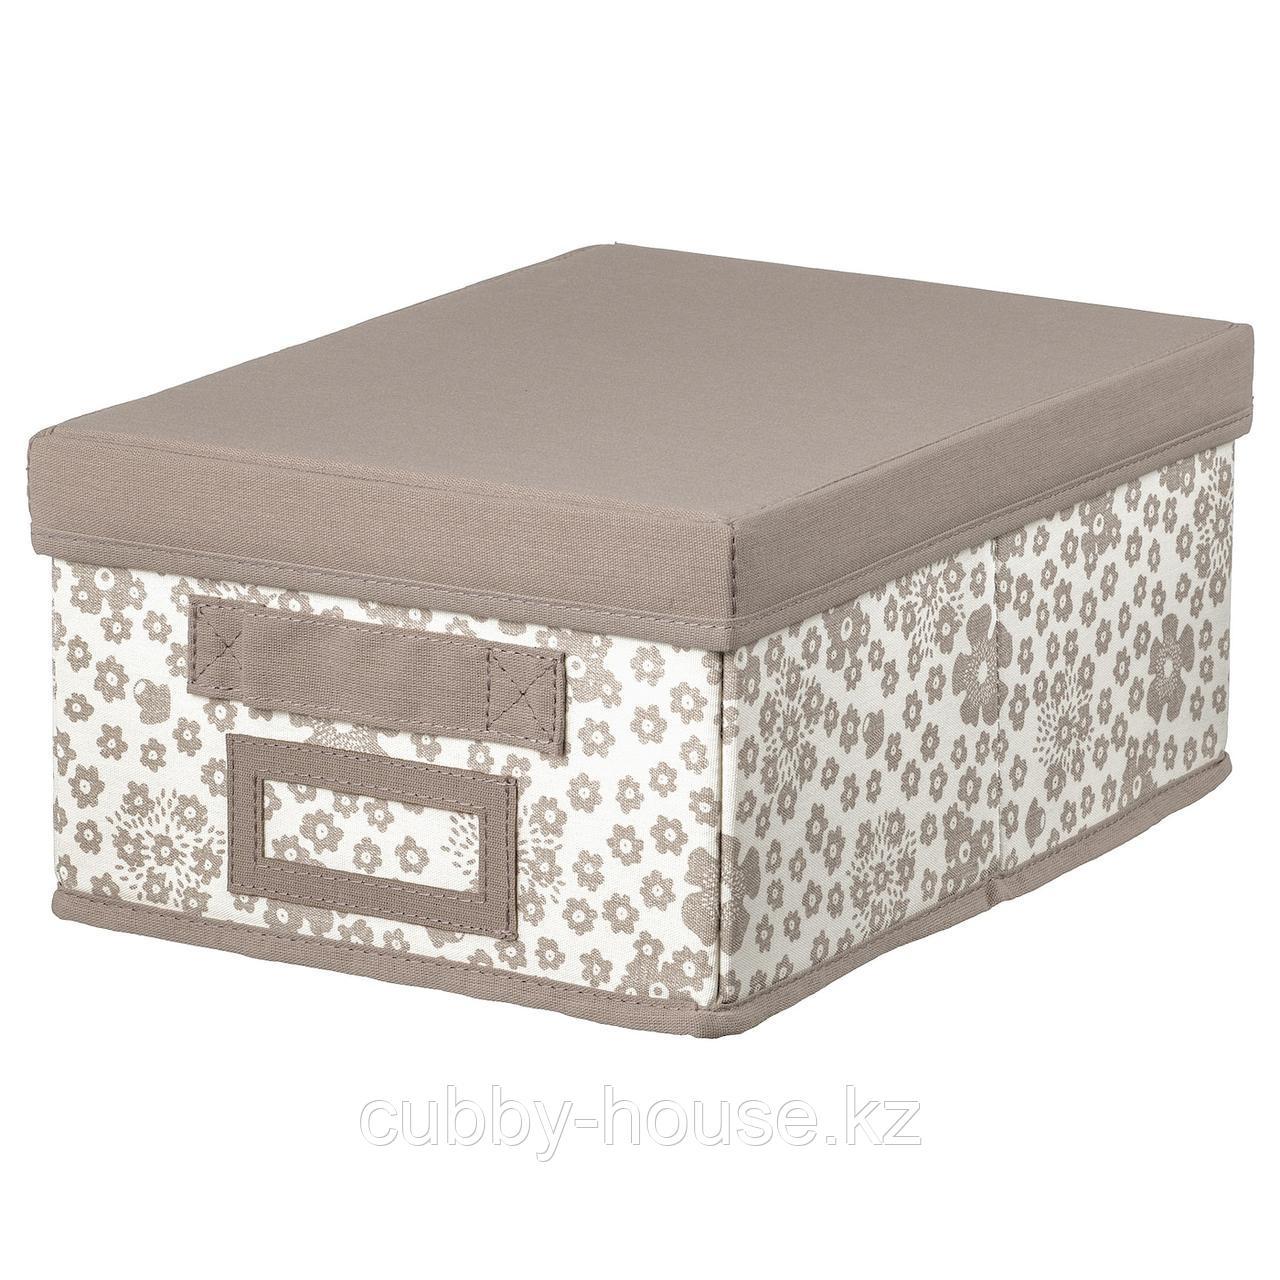 СТОРСТАББЕ Коробка с крышкой, бежевый, 25x35x15 см